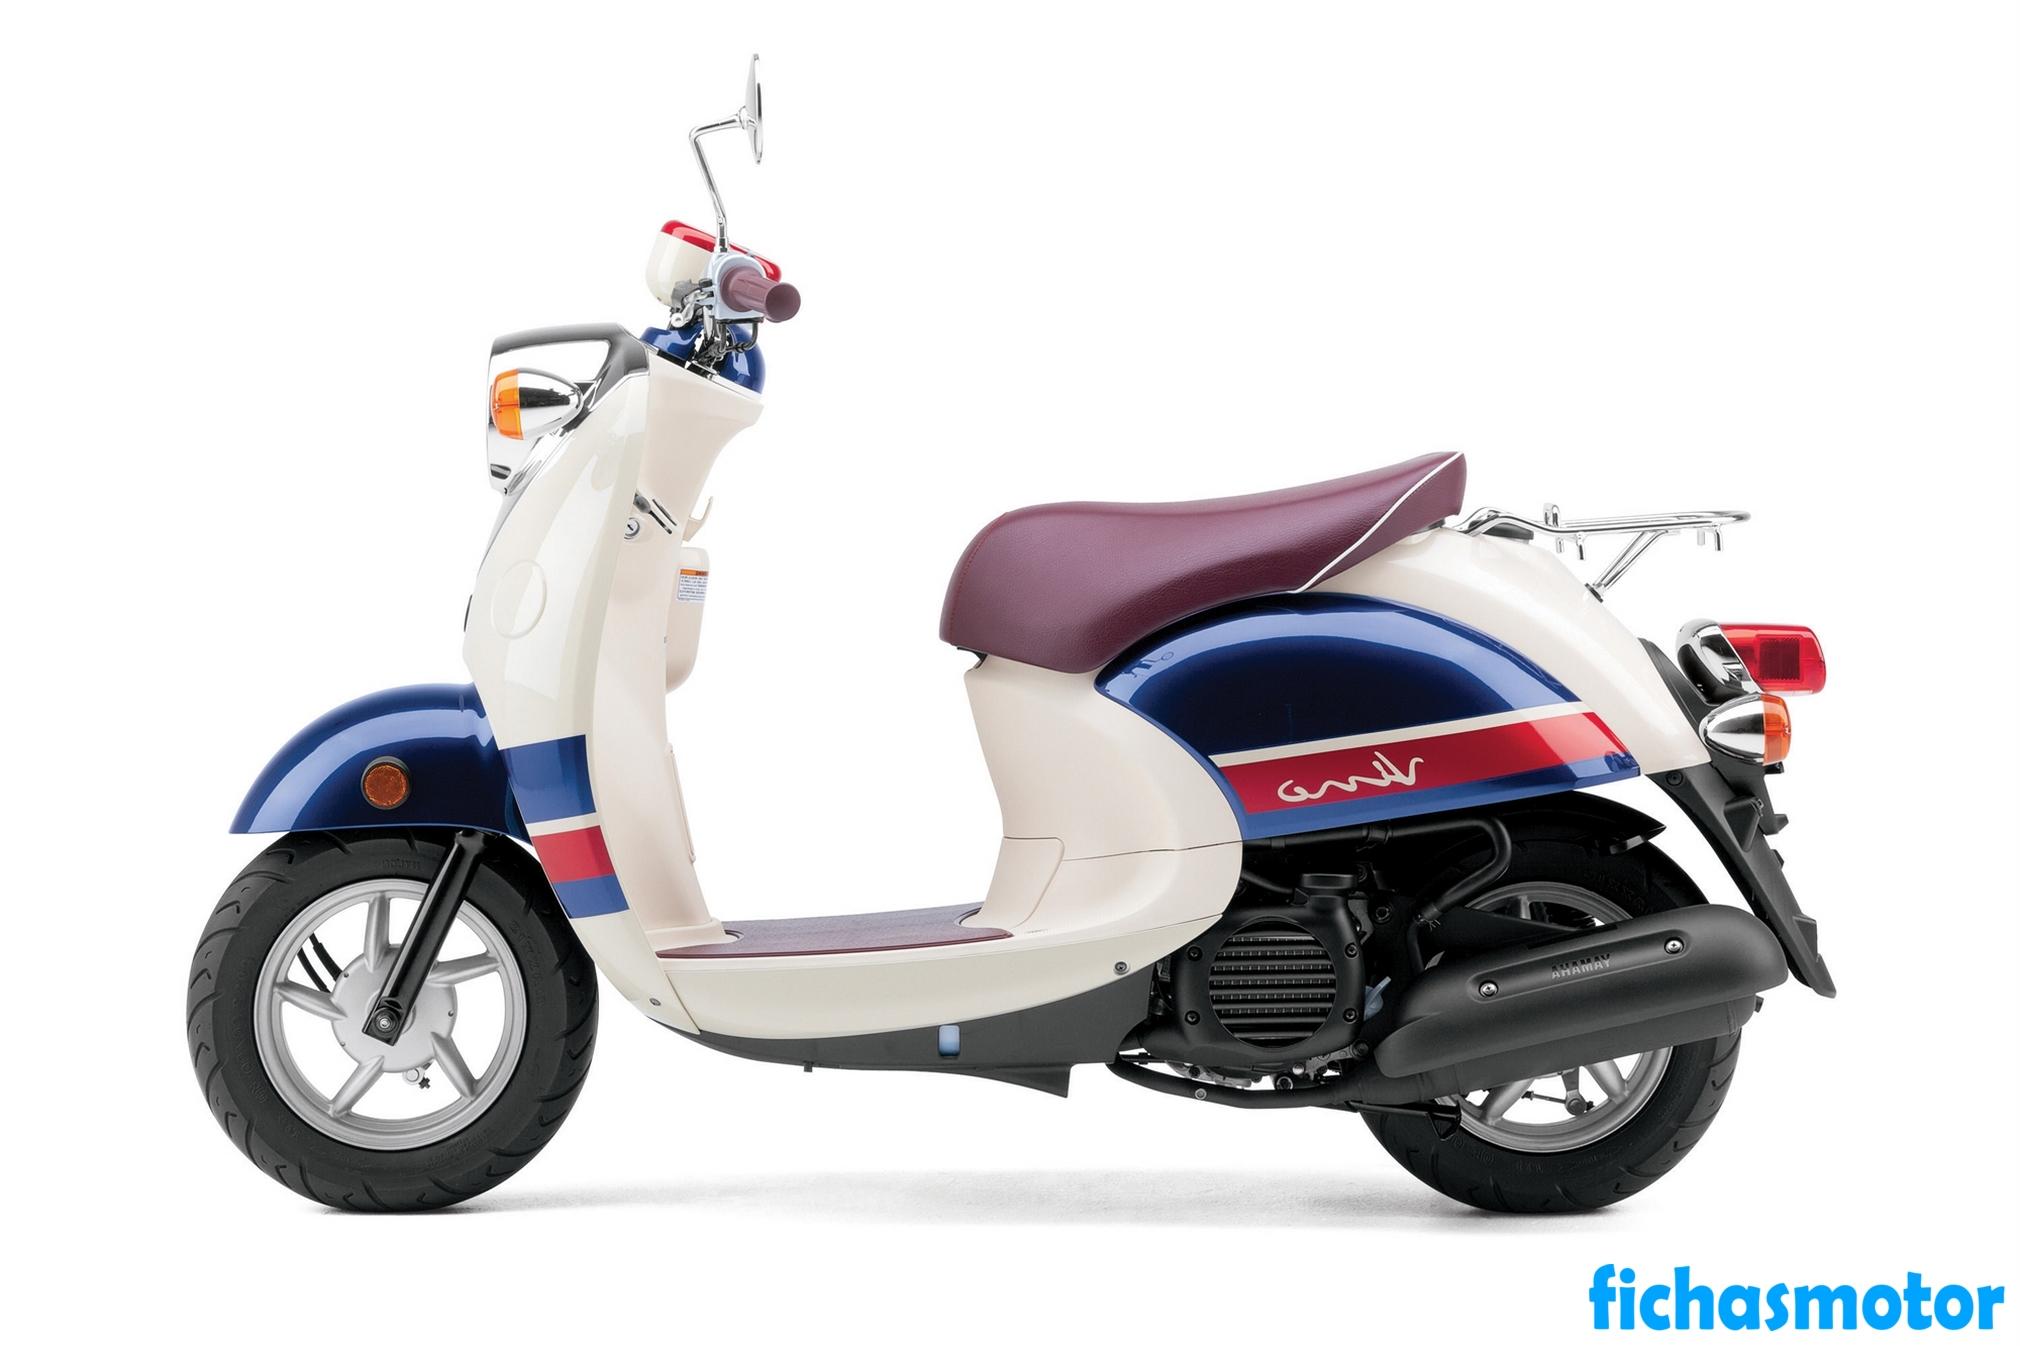 Ficha técnica Yamaha vino Classic 2014